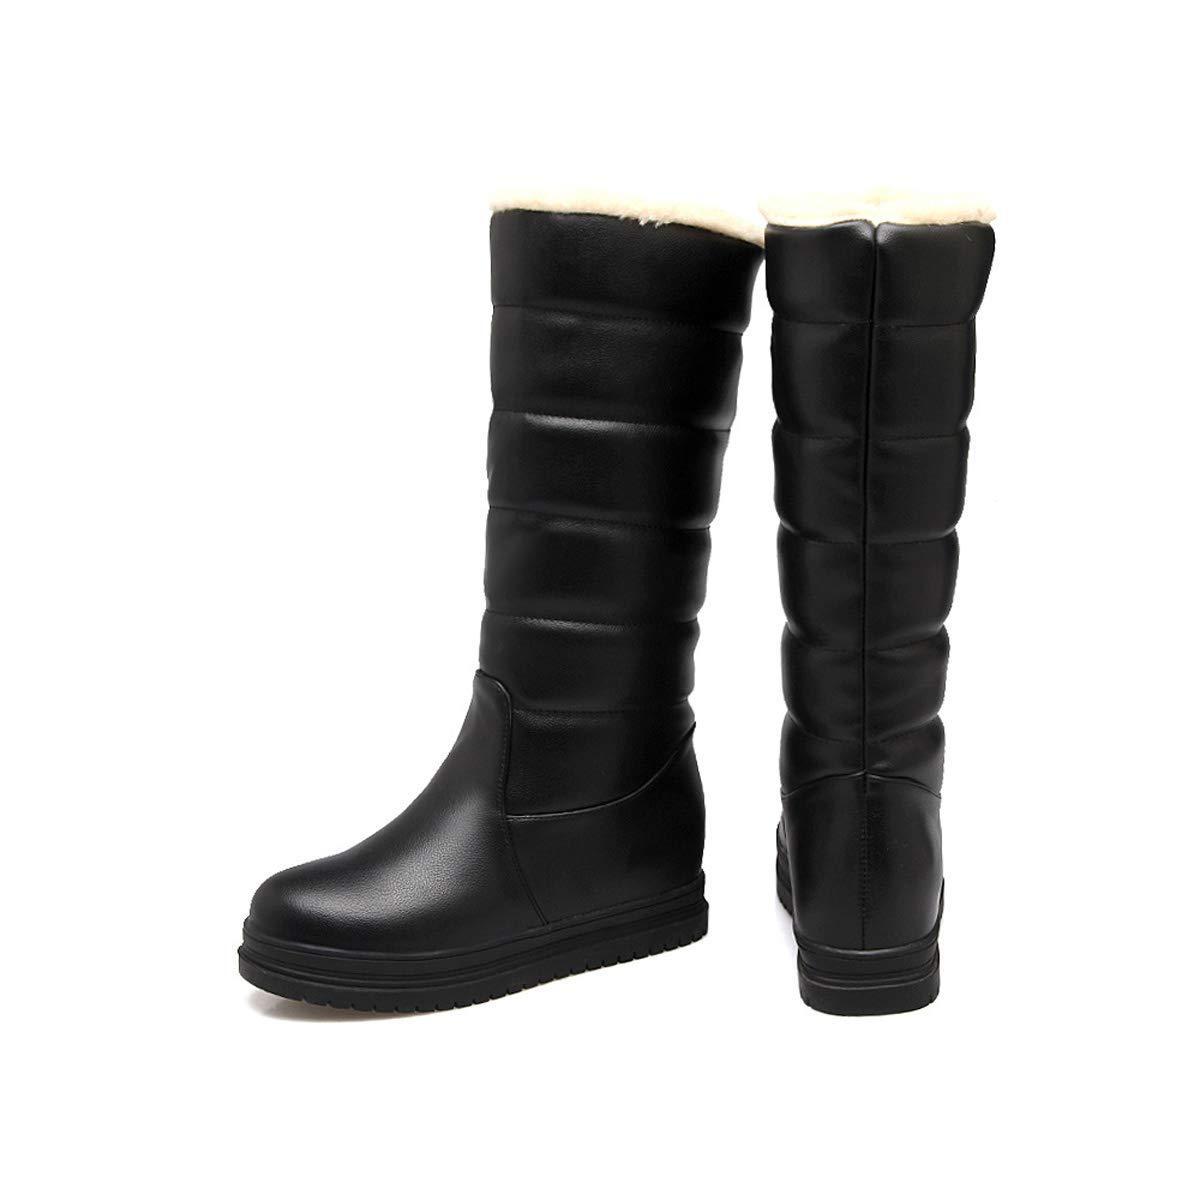 DANDANJIE Damen Winter warme Stiefel Mitte Mitte Mitte der Wade Stiefel Wasserdichte Schneeschuhe (Schwarz Weiß Rosa),schwarz,35EU  4b16d5